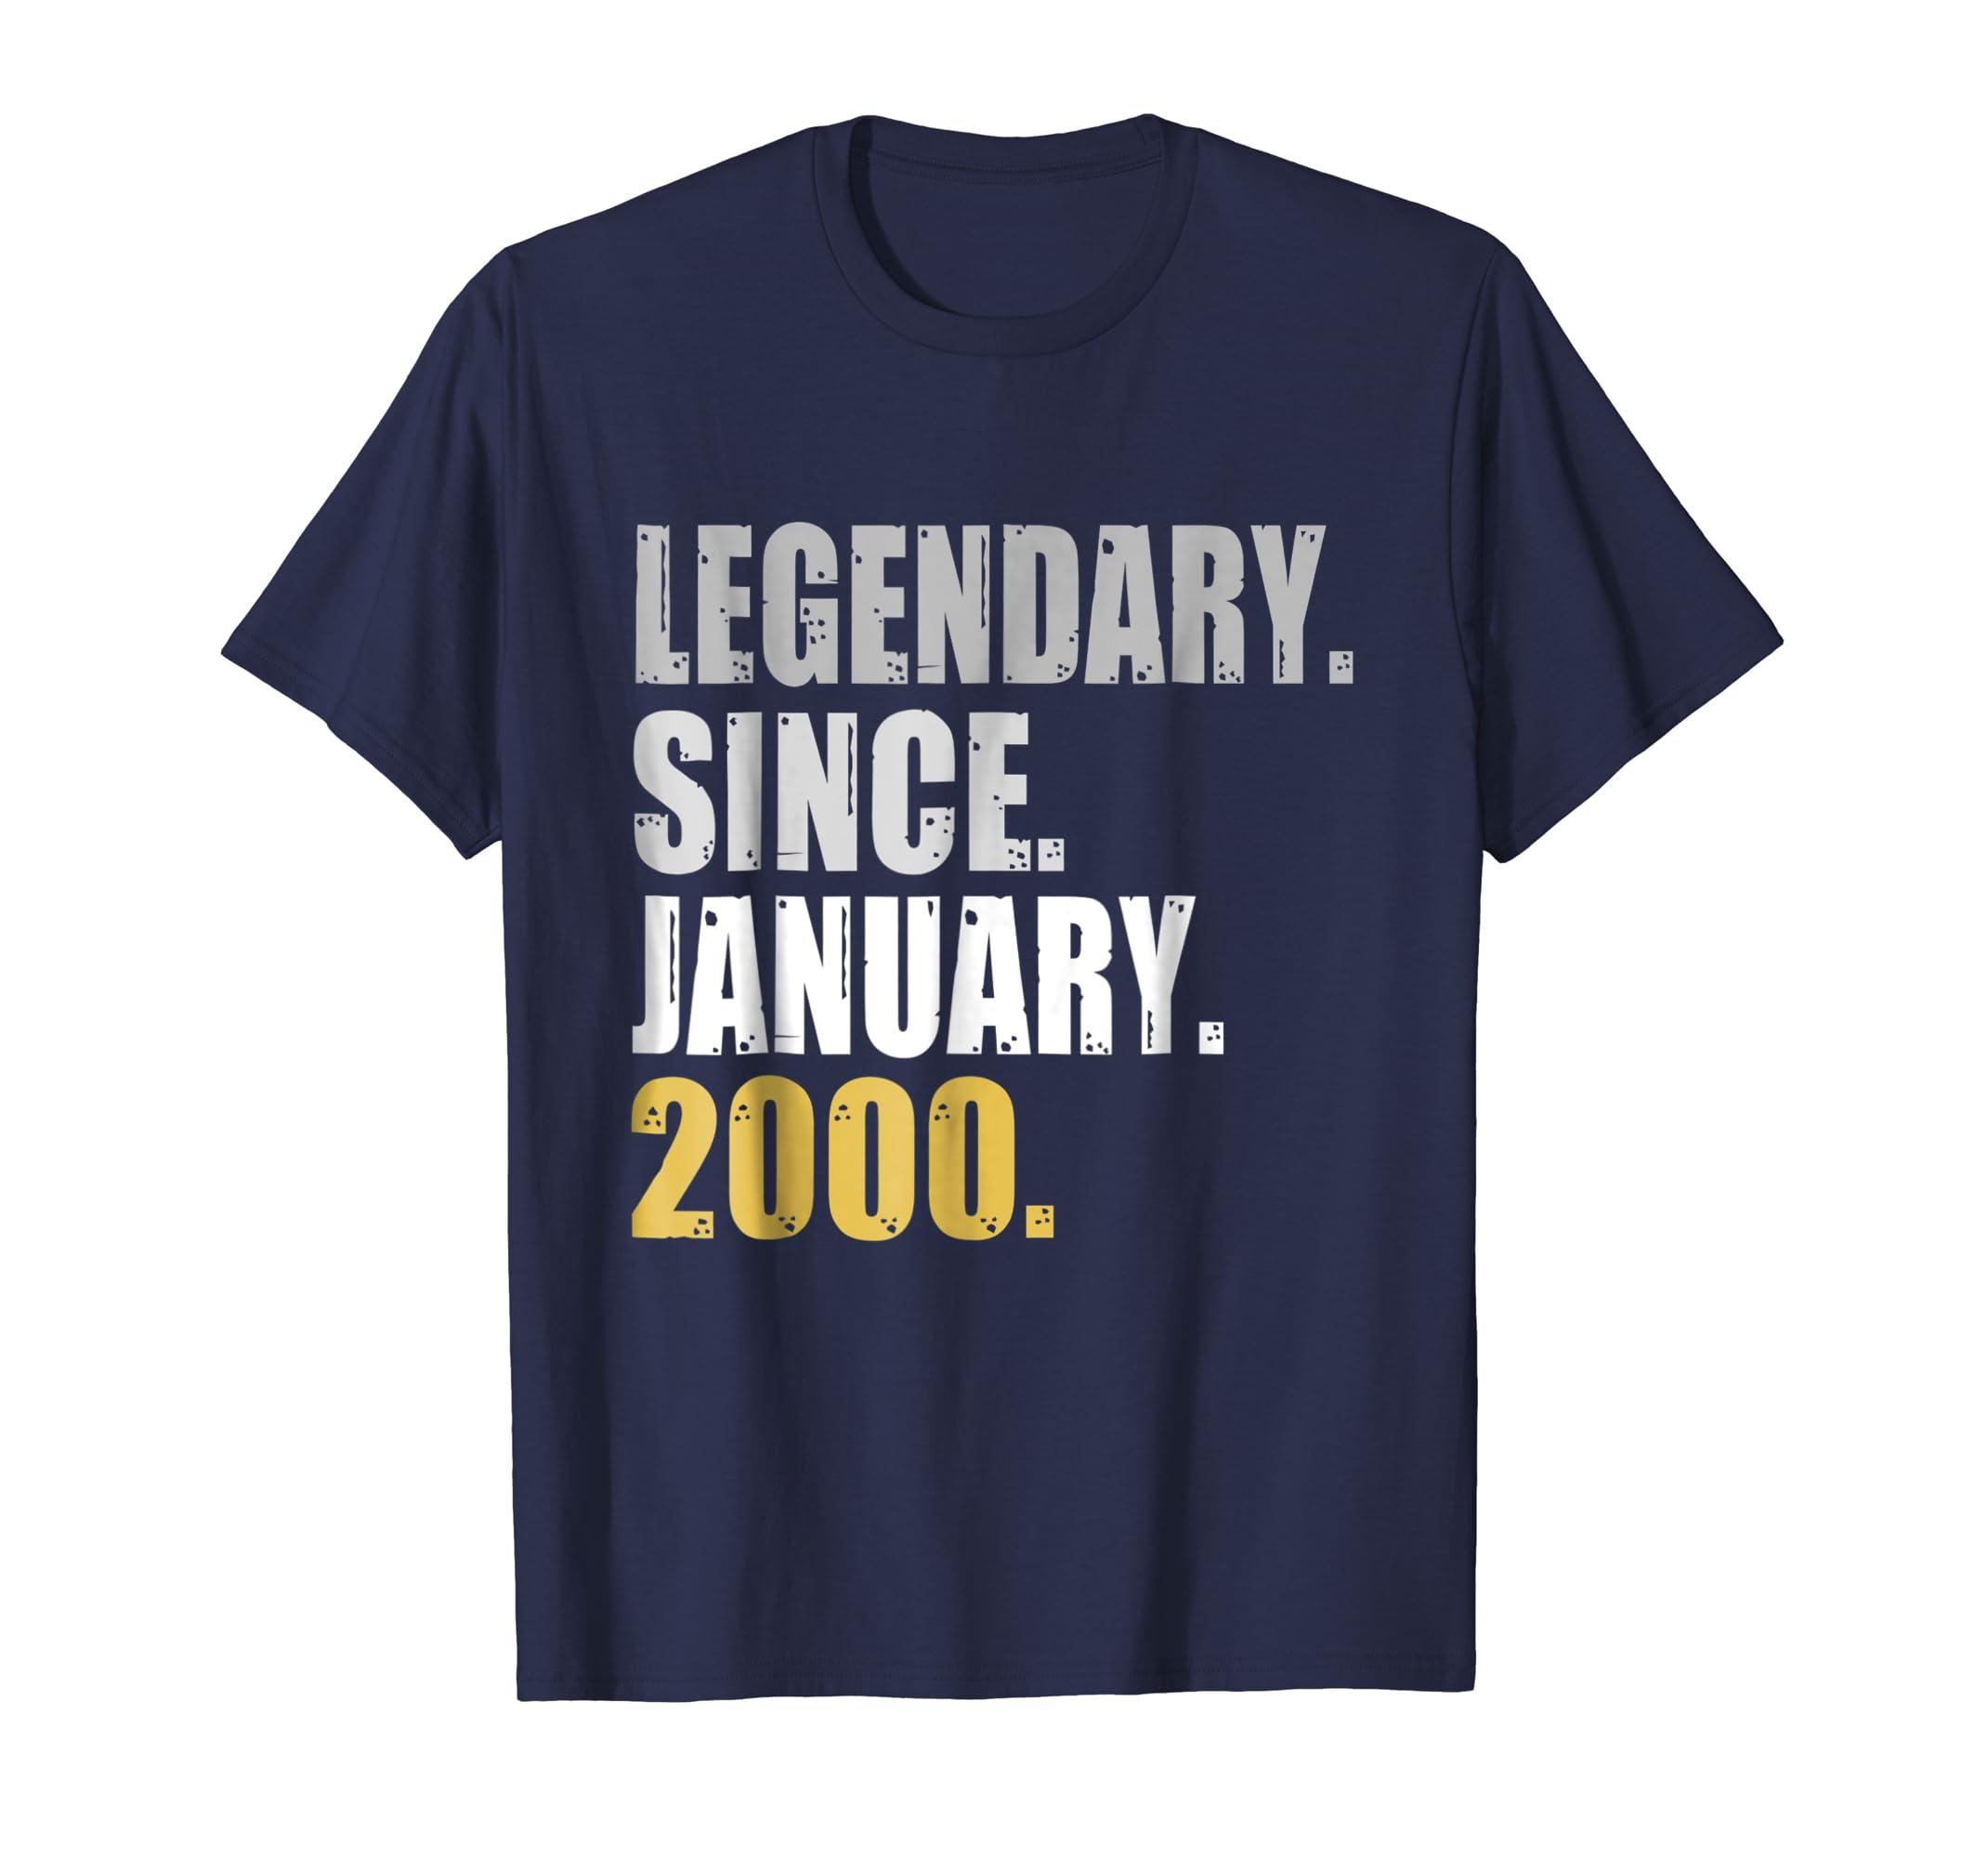 19th Birthday Gifts Legendary Since January 2000 T Shirt-azvn